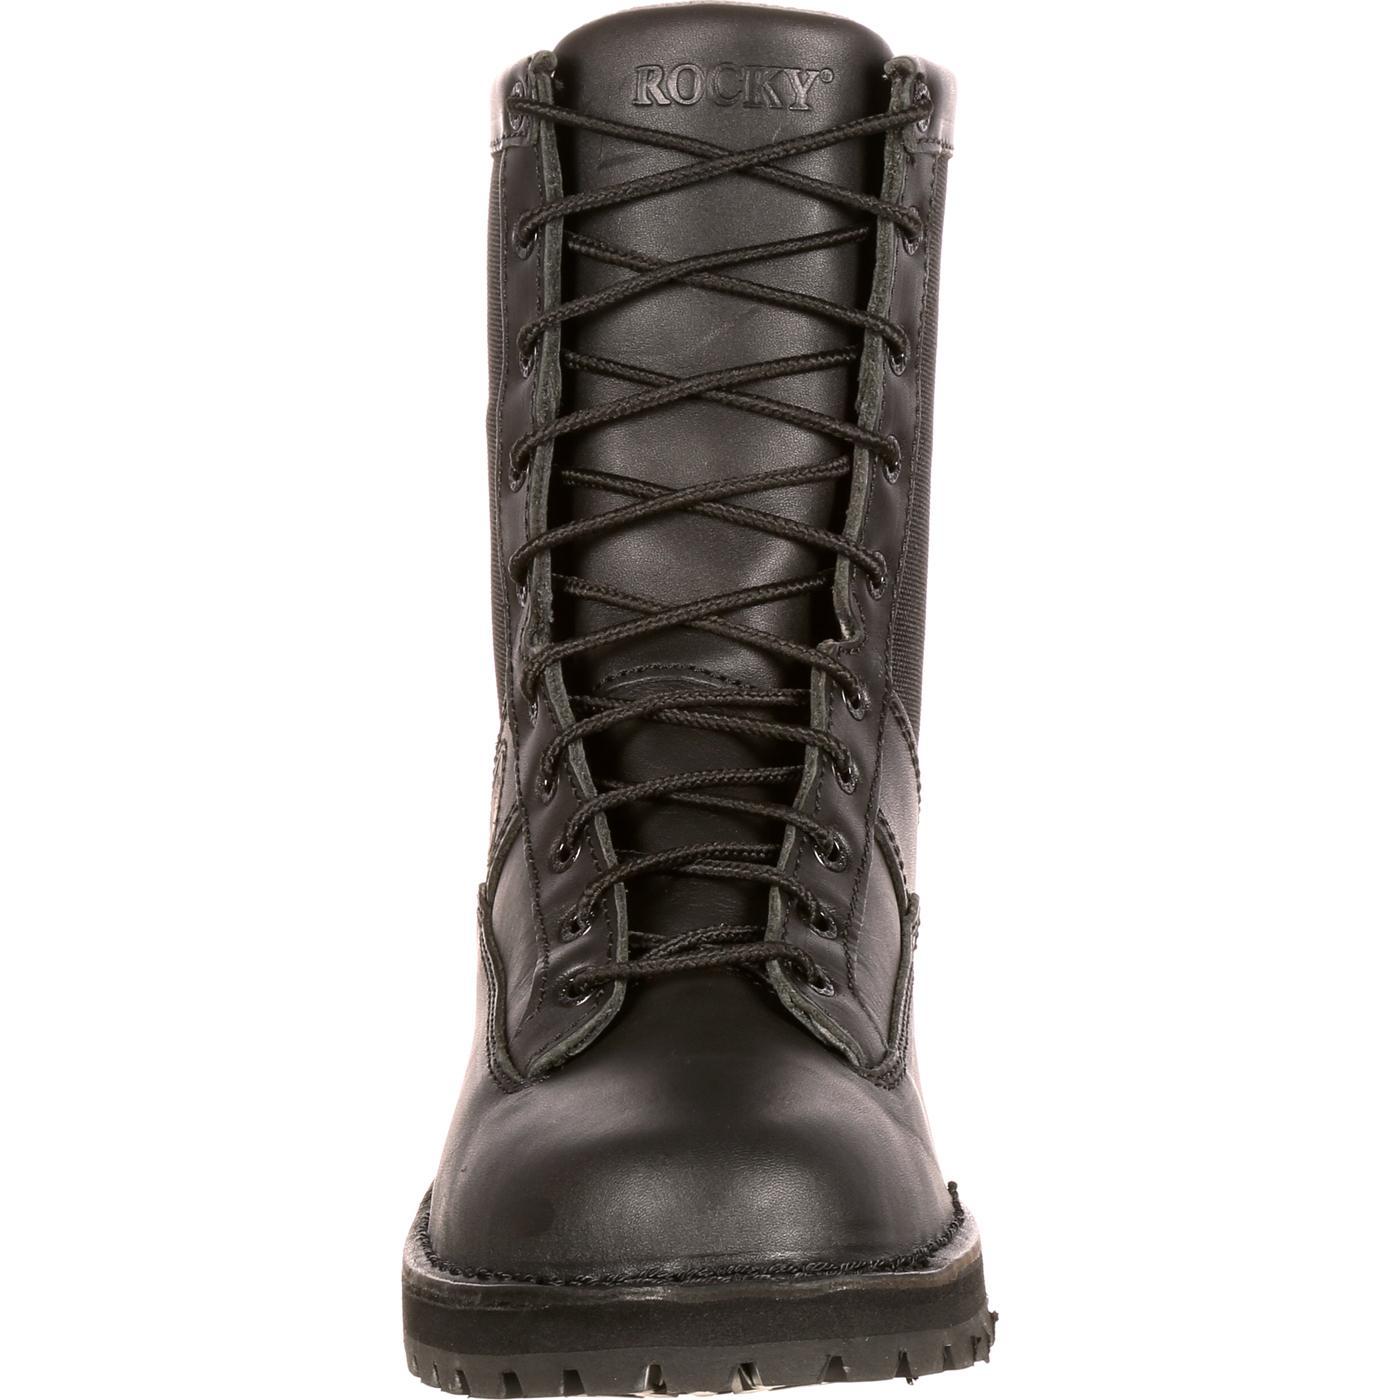 53a8c070d11 Rocky Portland Lace-to-Toe Waterproof Public Service Boots